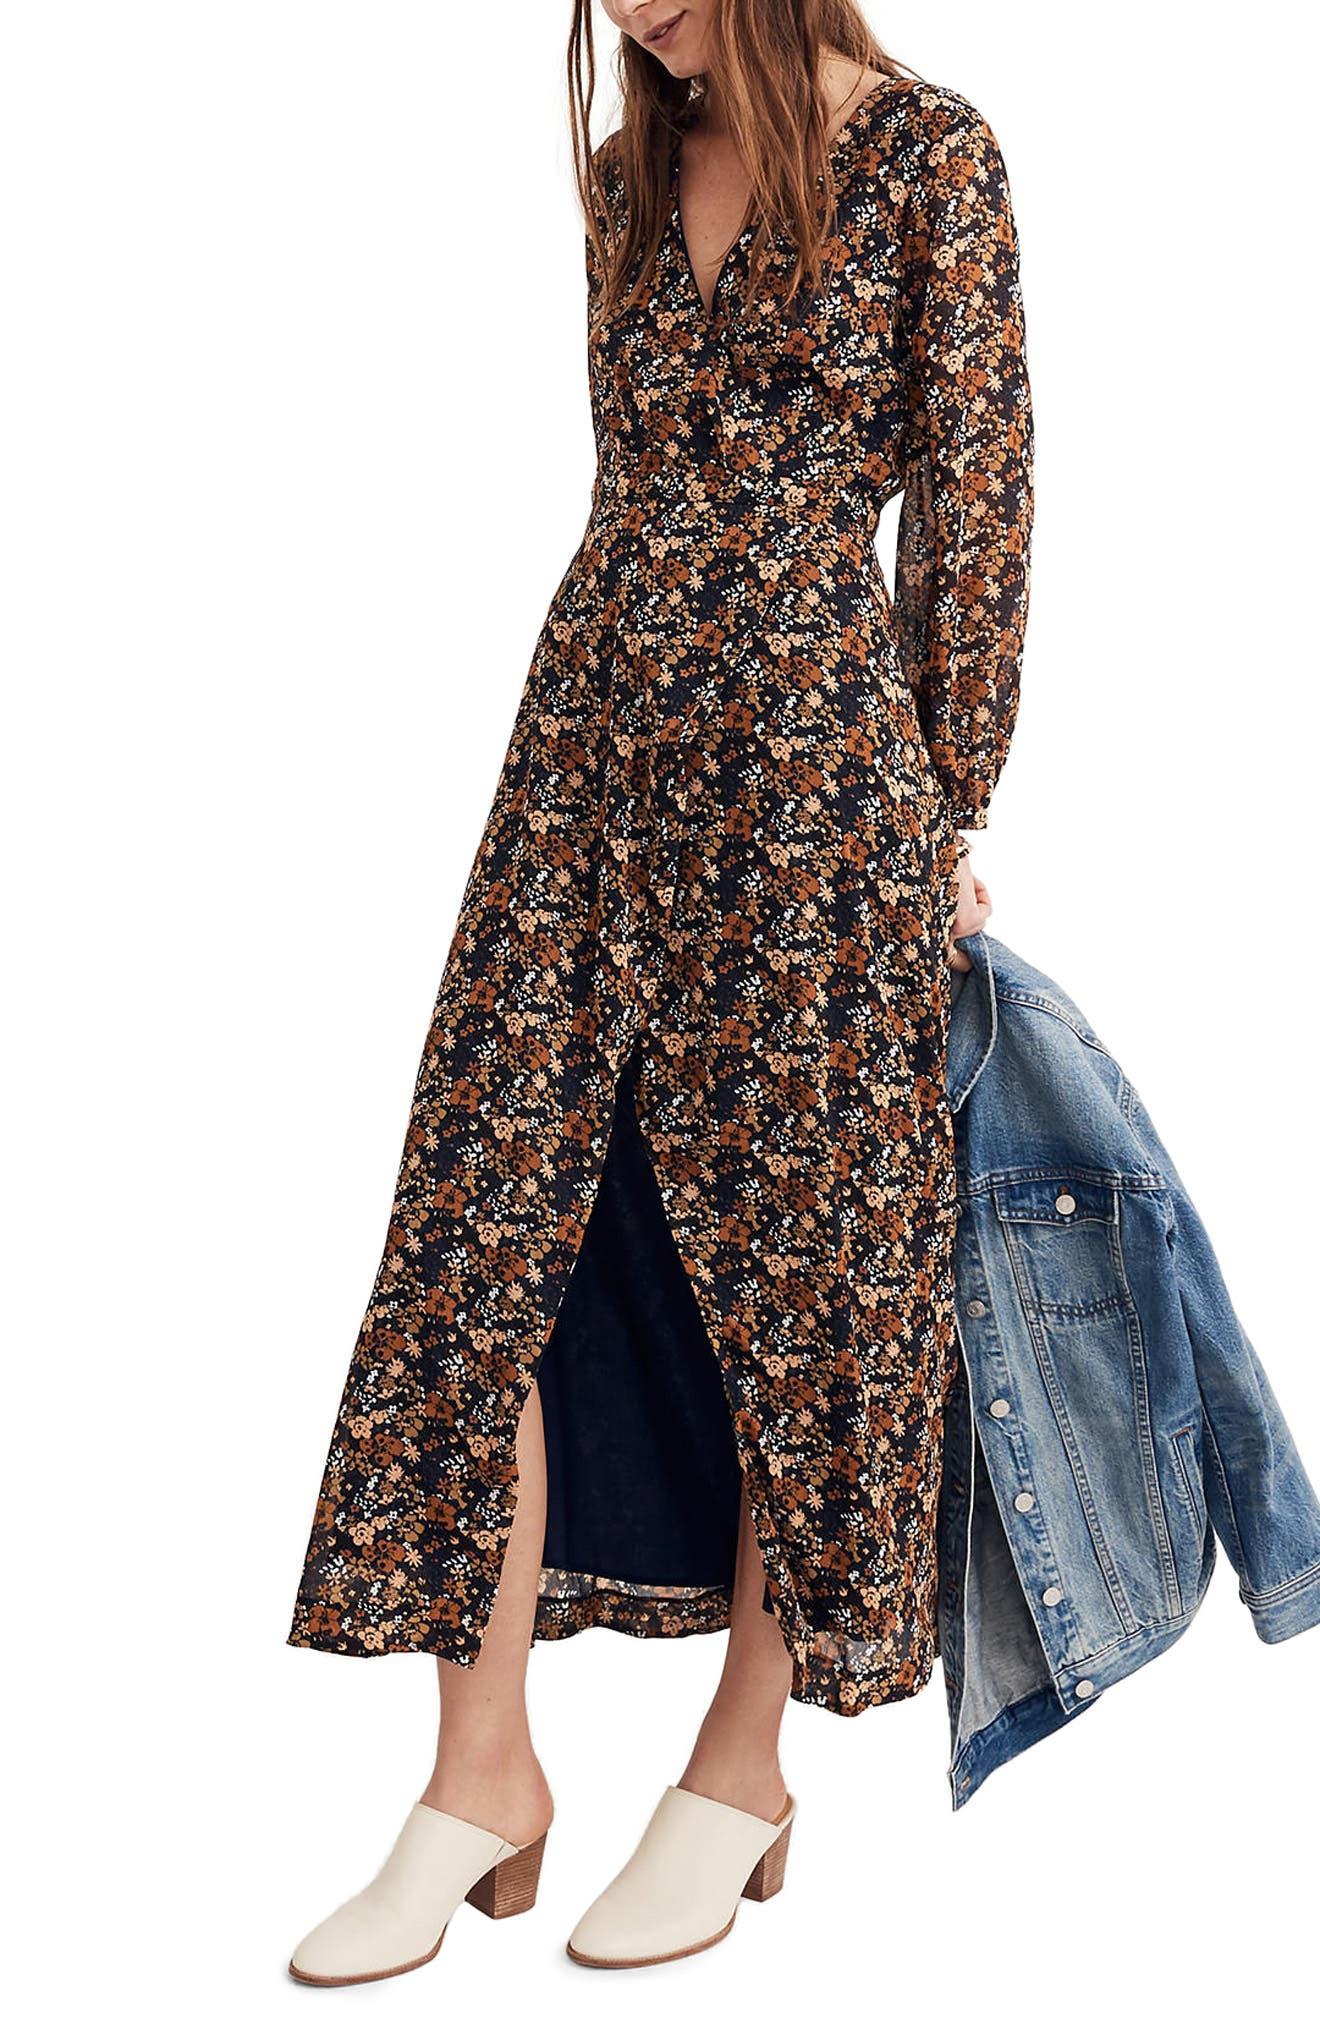 Nightflower Maxi Dress,                             Main thumbnail 1, color,                             200